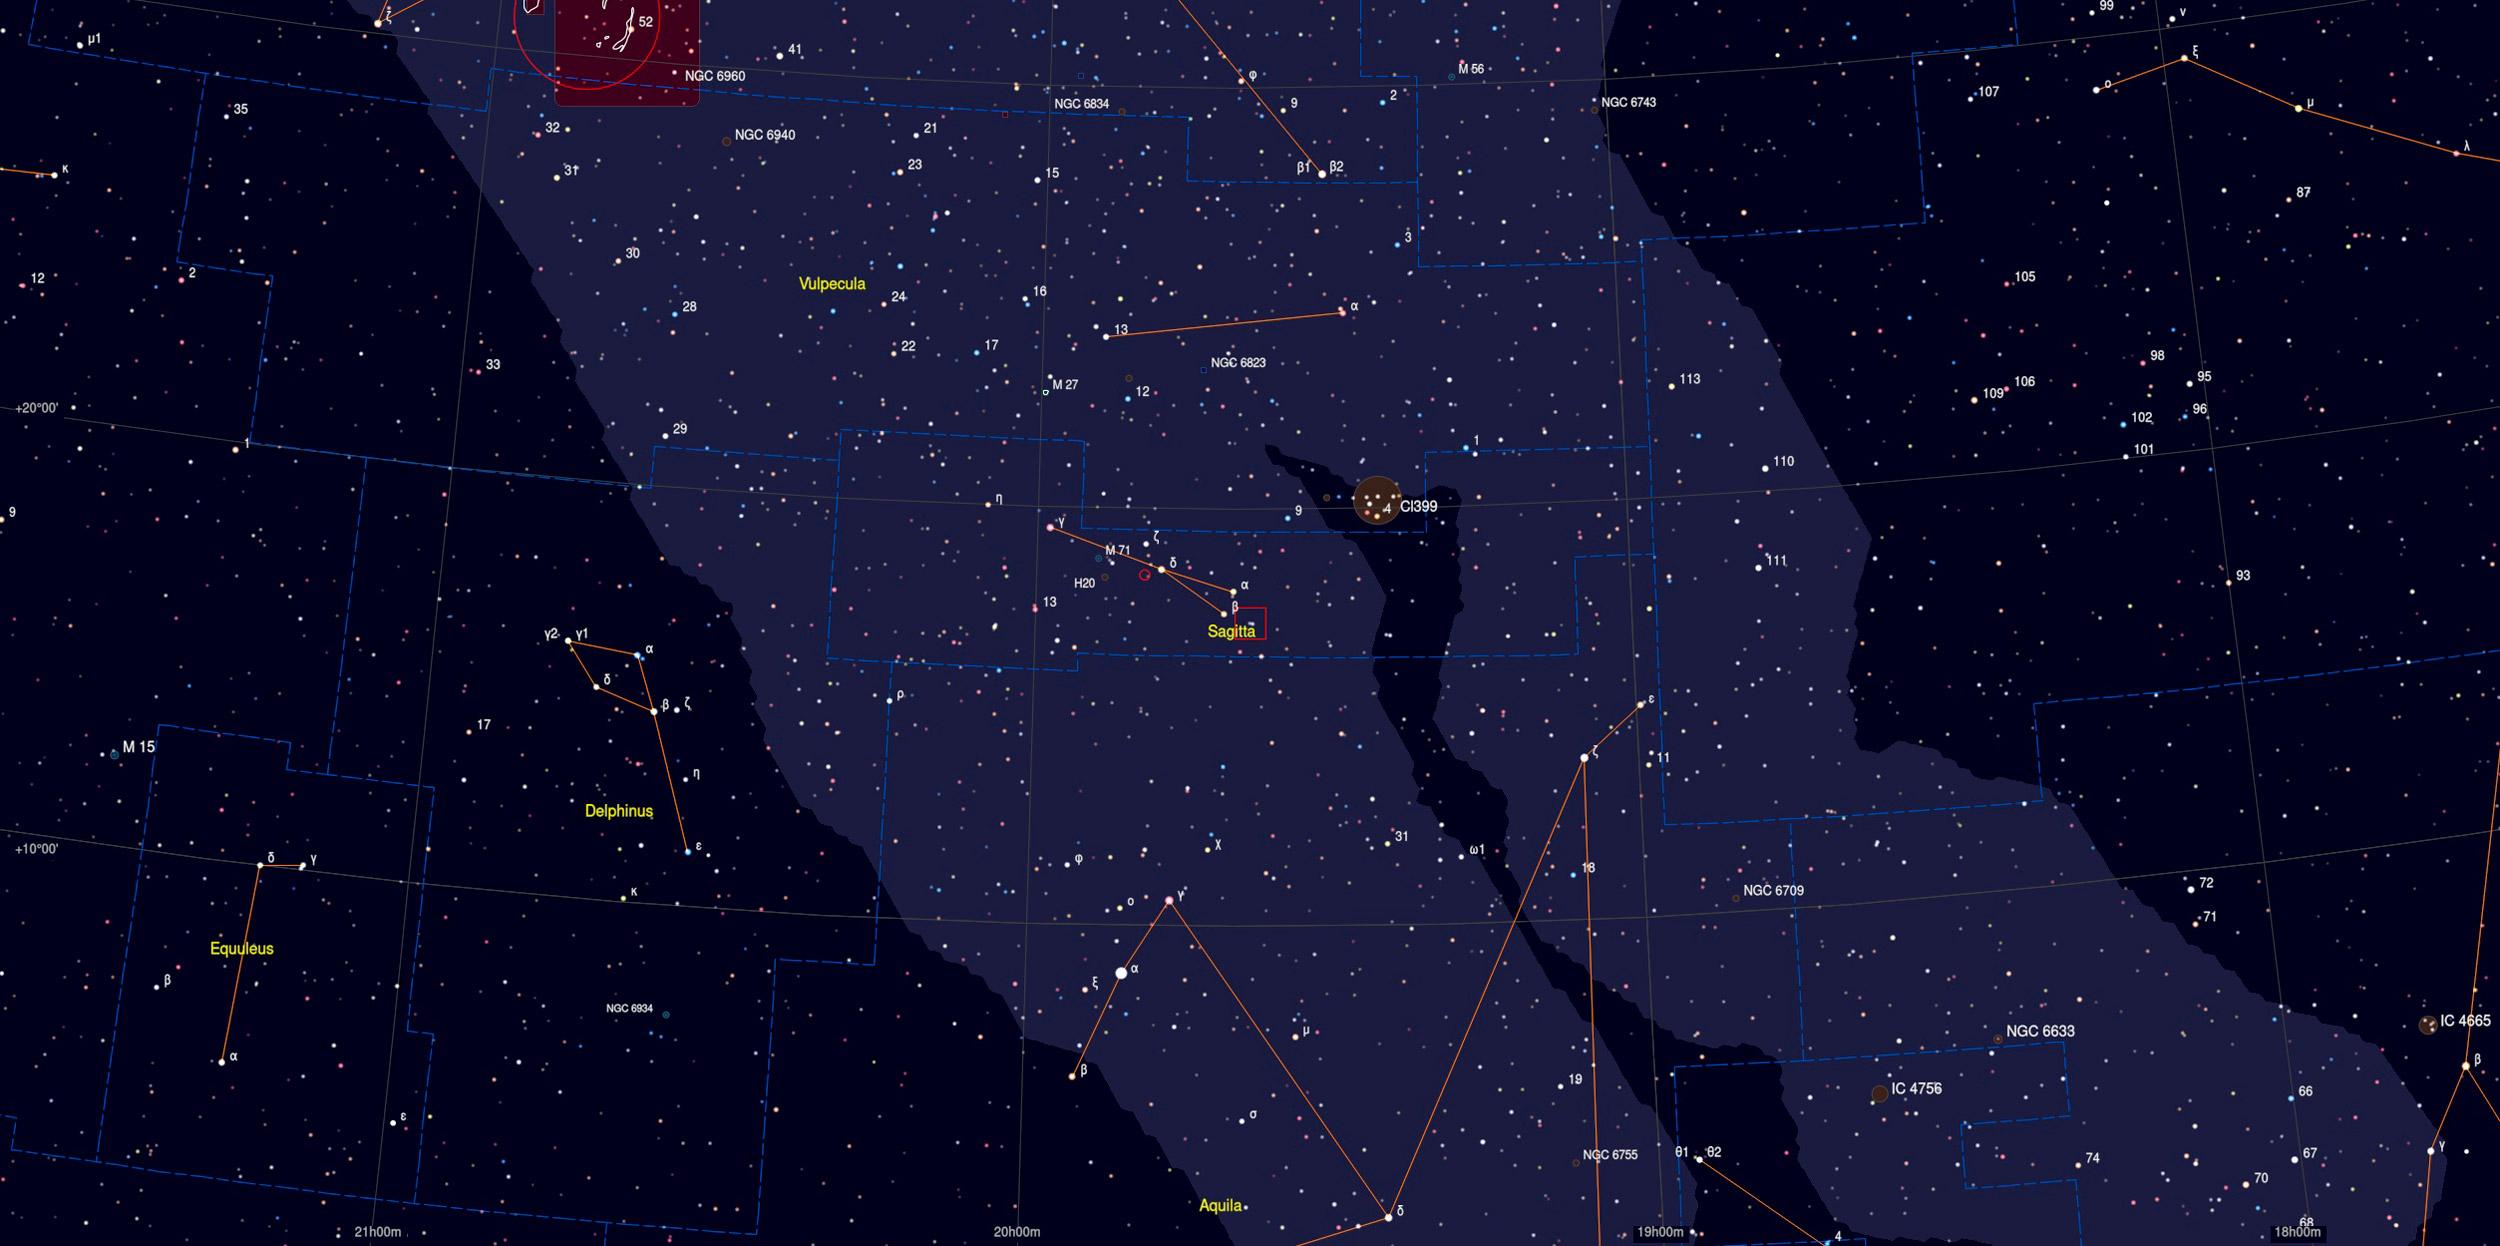 3C 400.2 Sky Chart - Astrophotography Martin Rusterholz